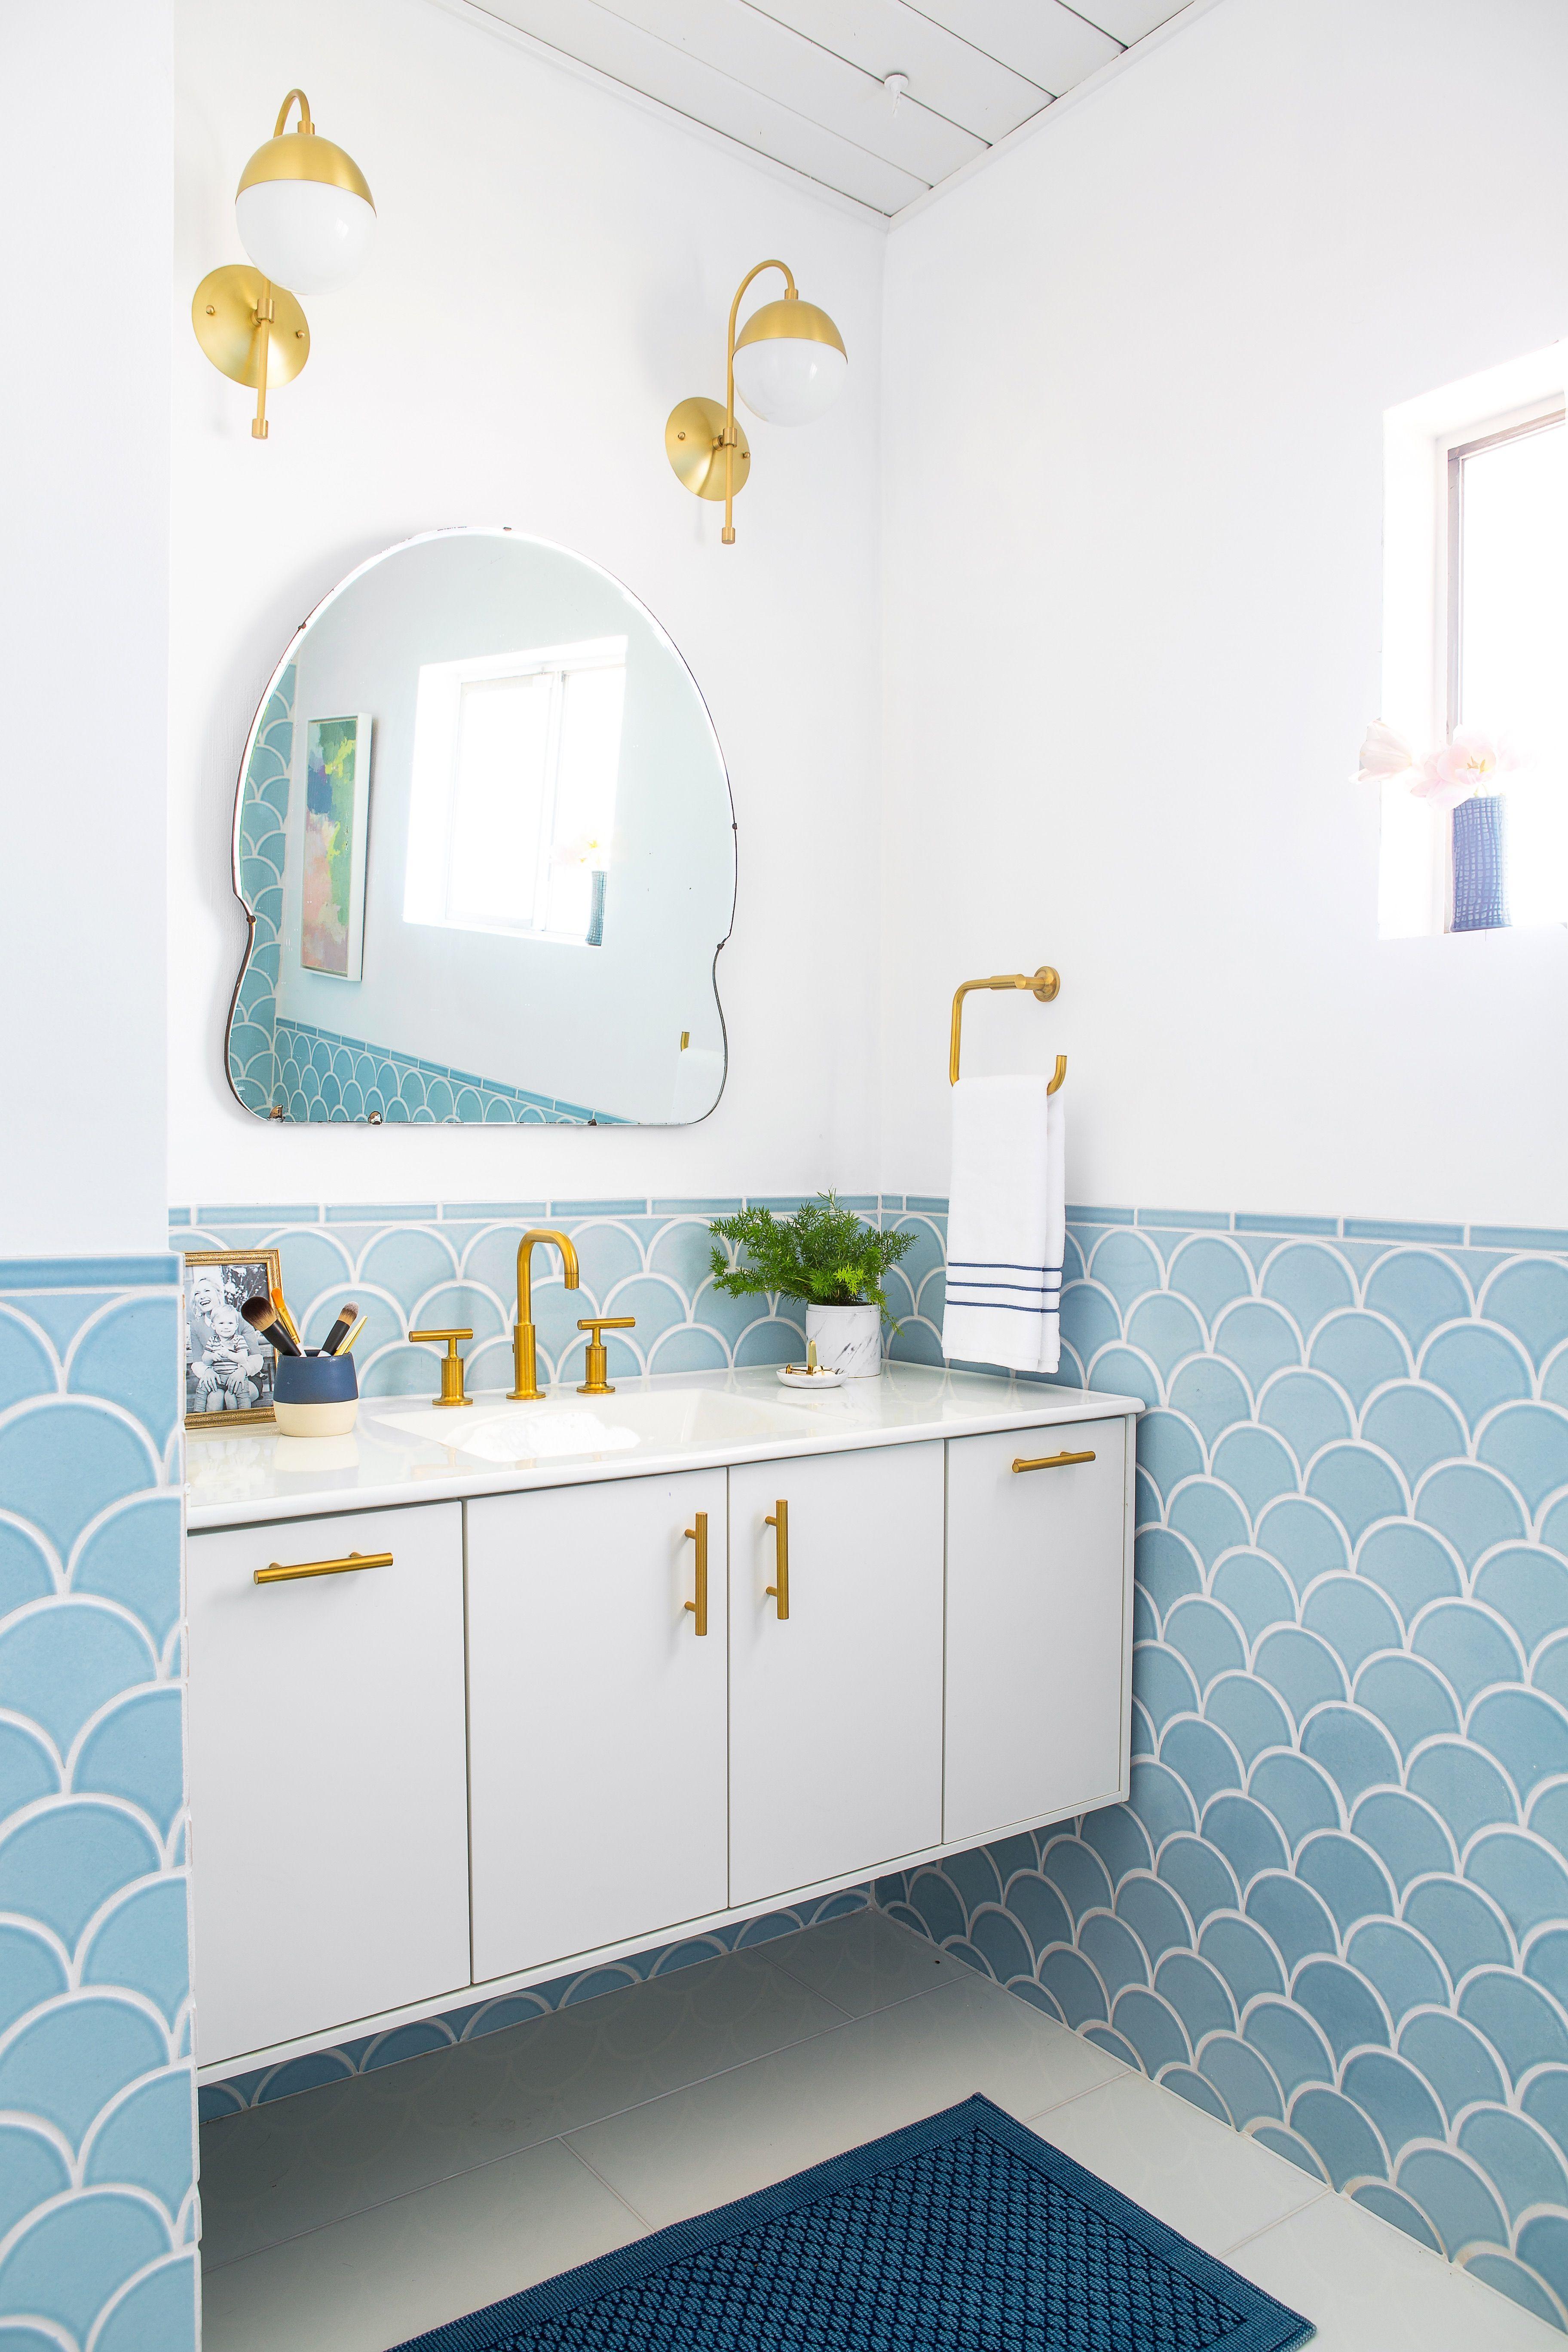 30 bathroom tile design ideas tile backsplash and floor designs rh housebeautiful com bathroom tile wall ideas bathroom tile wall design